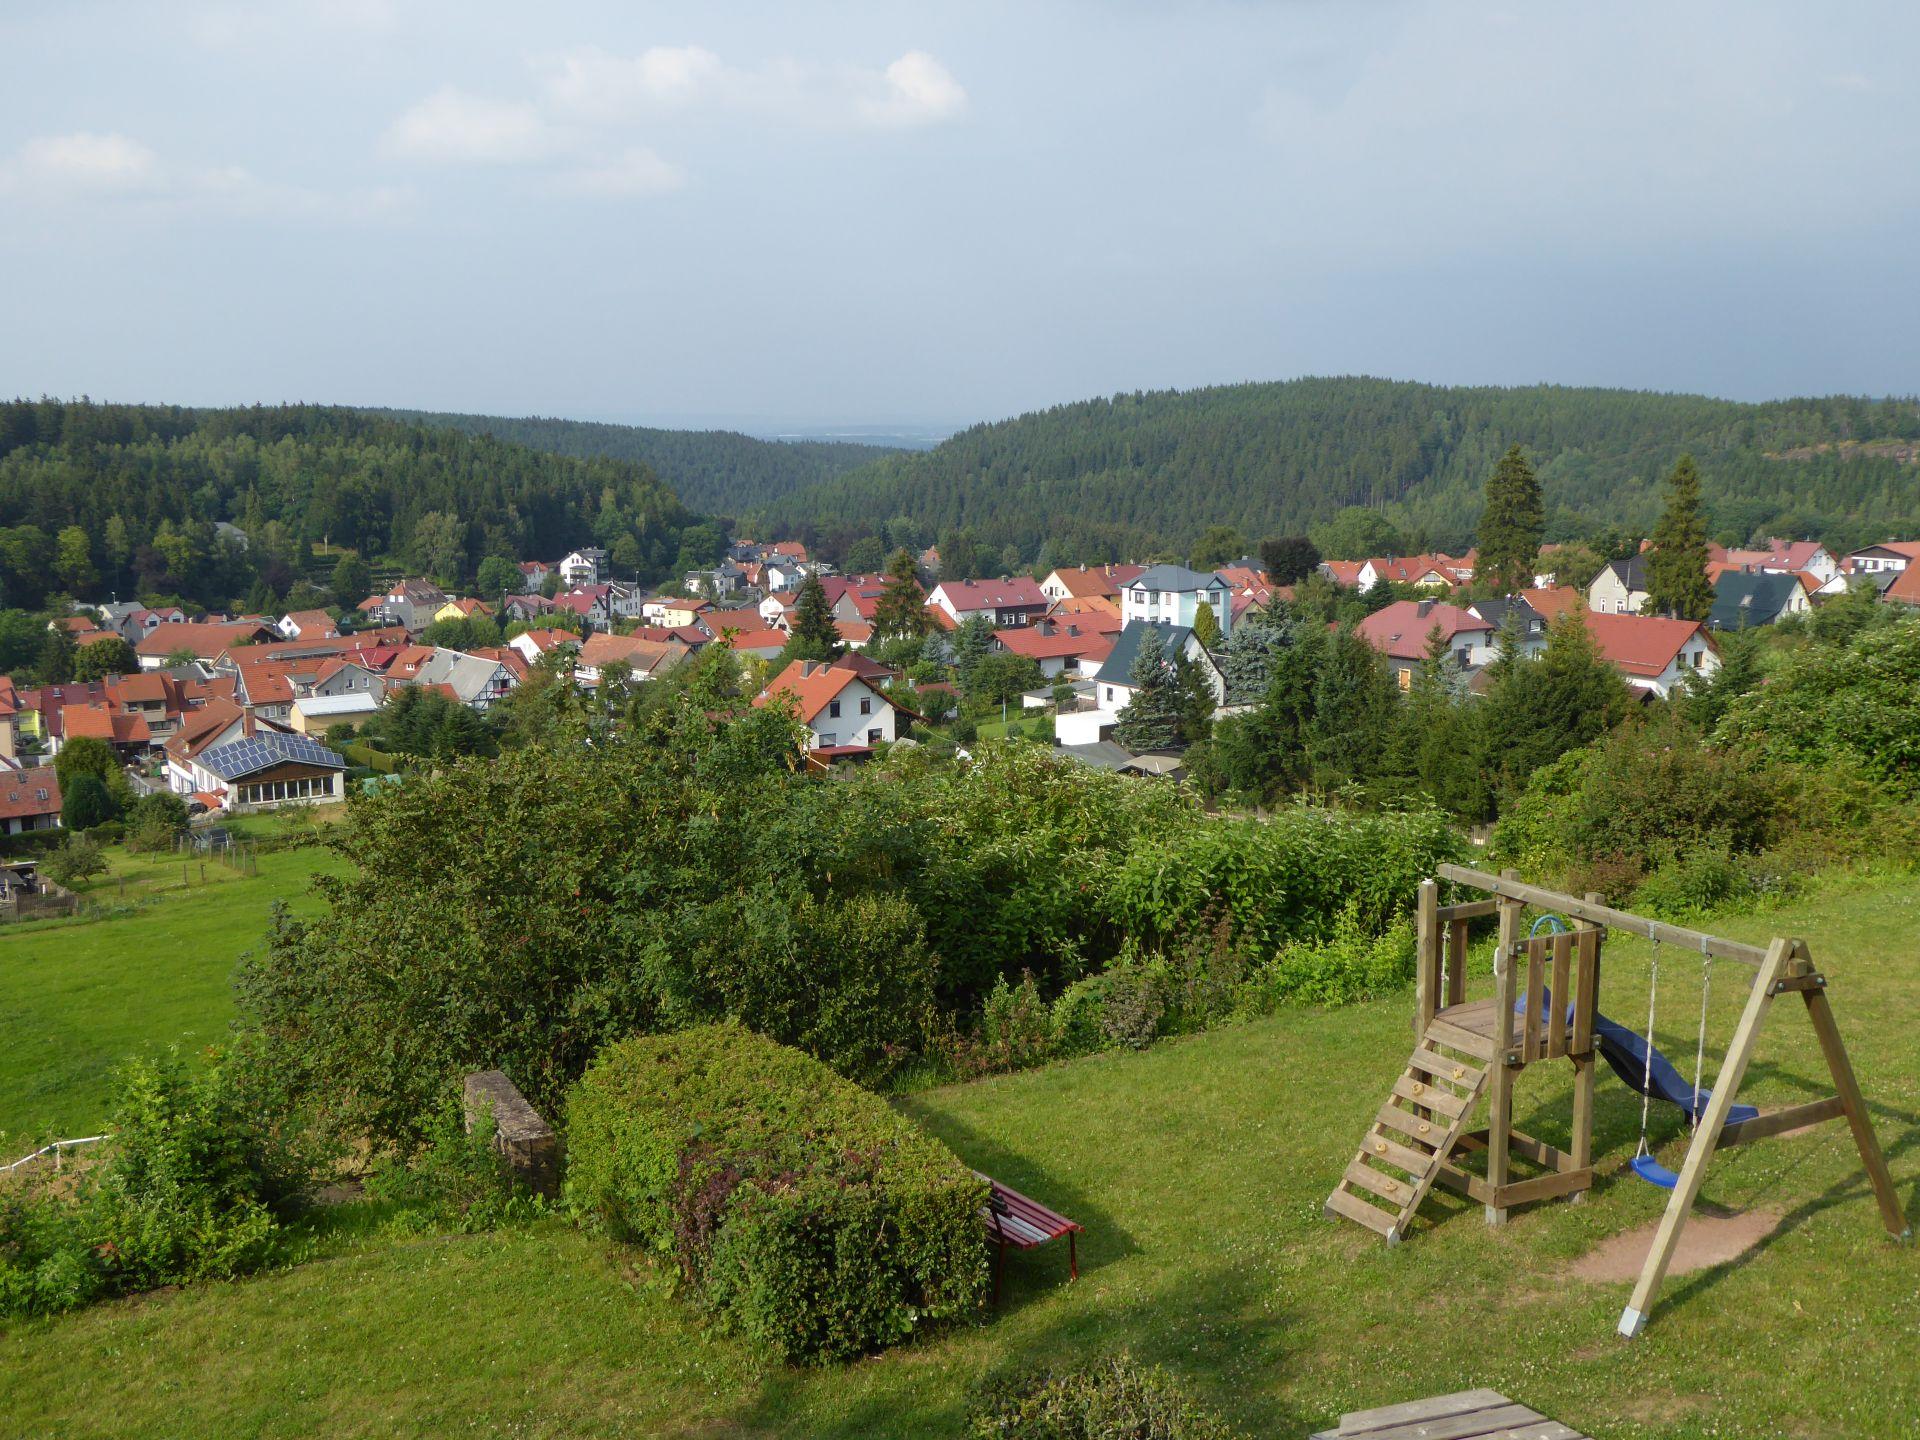 28 juli 2014 Tilburg – Friedrichroda